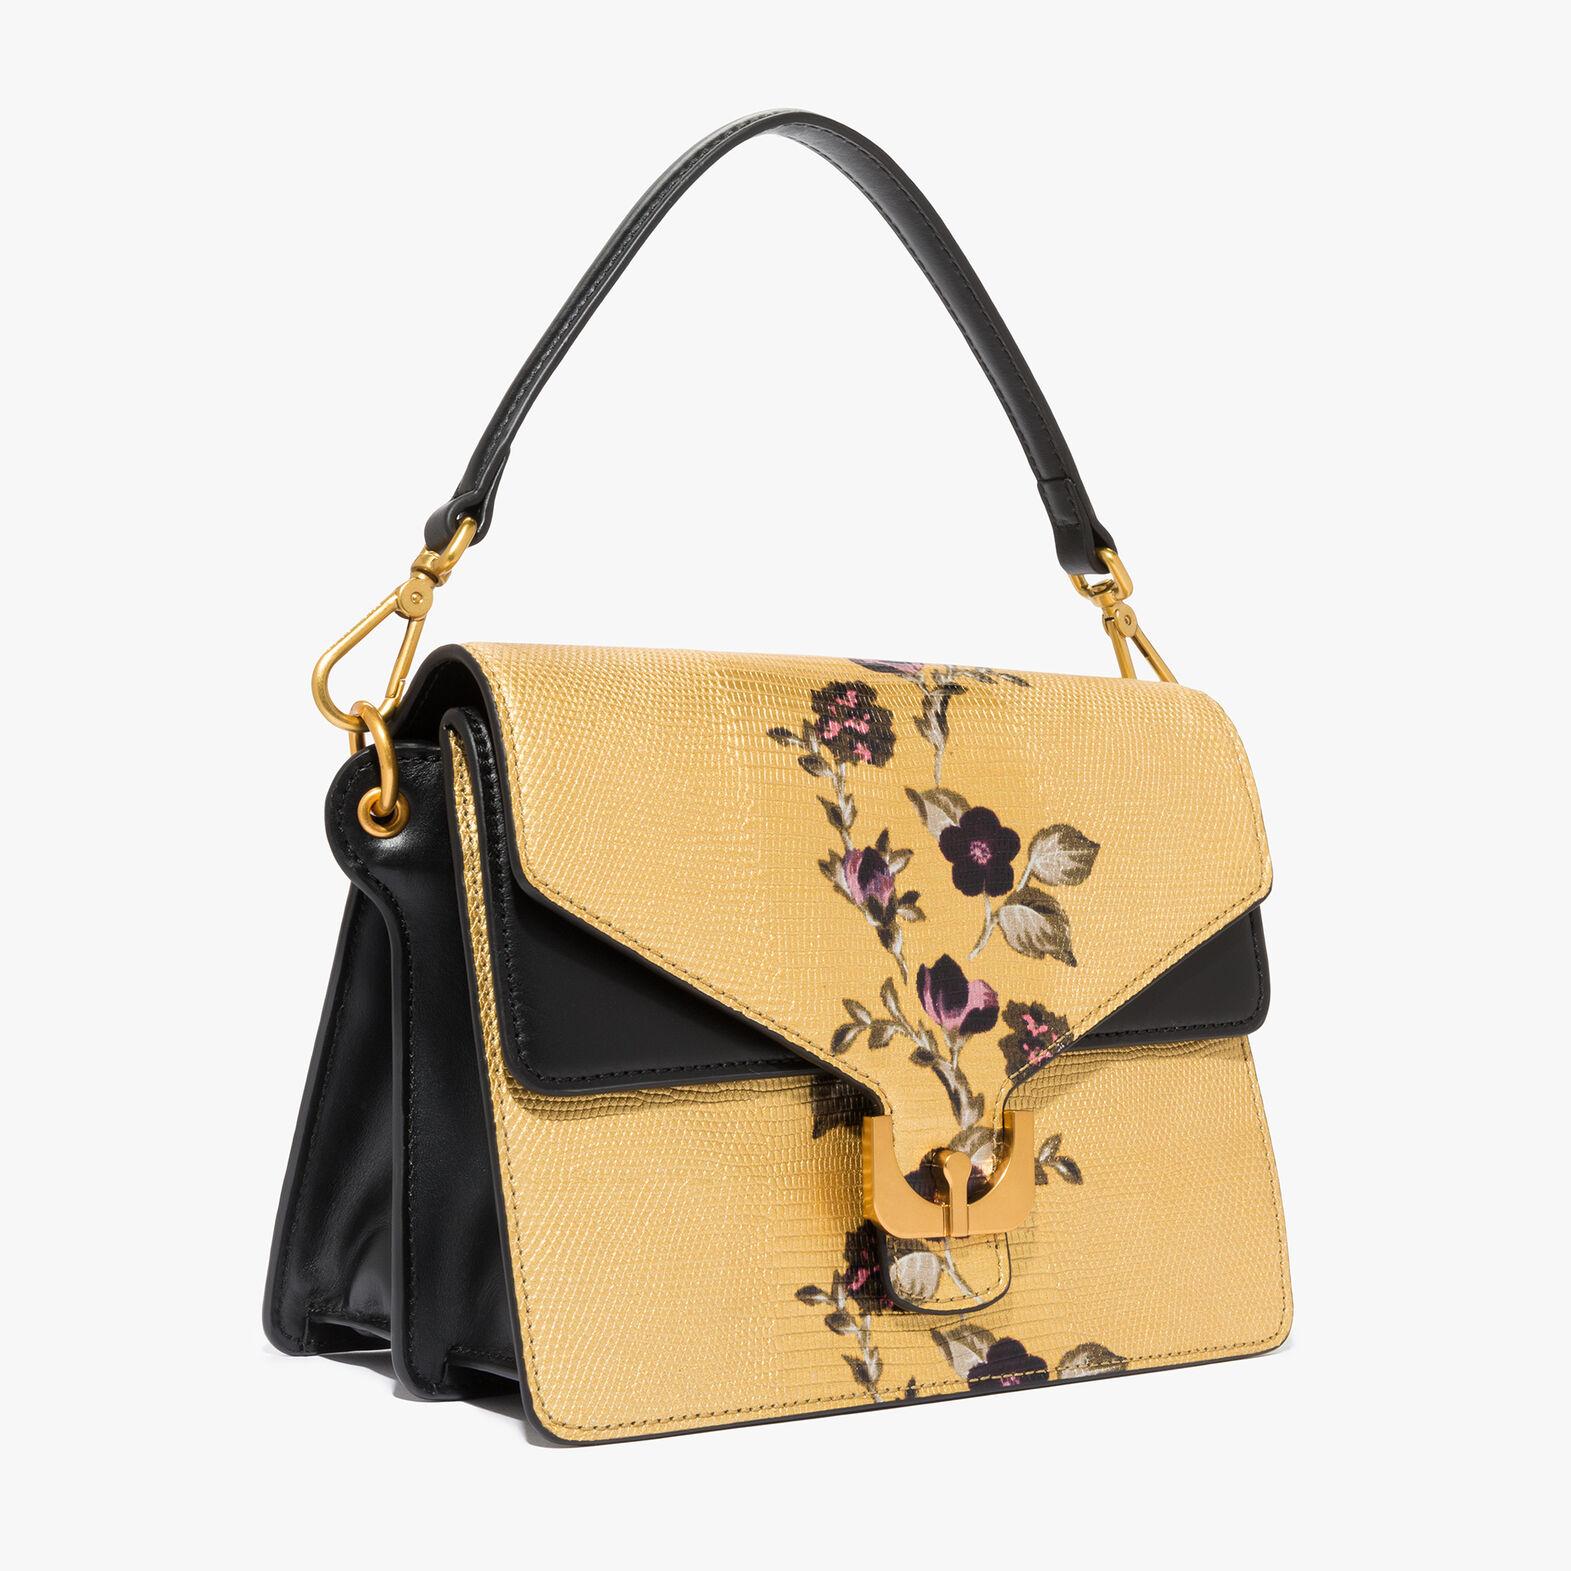 Ambrine lizard-print leather bag with a single strap